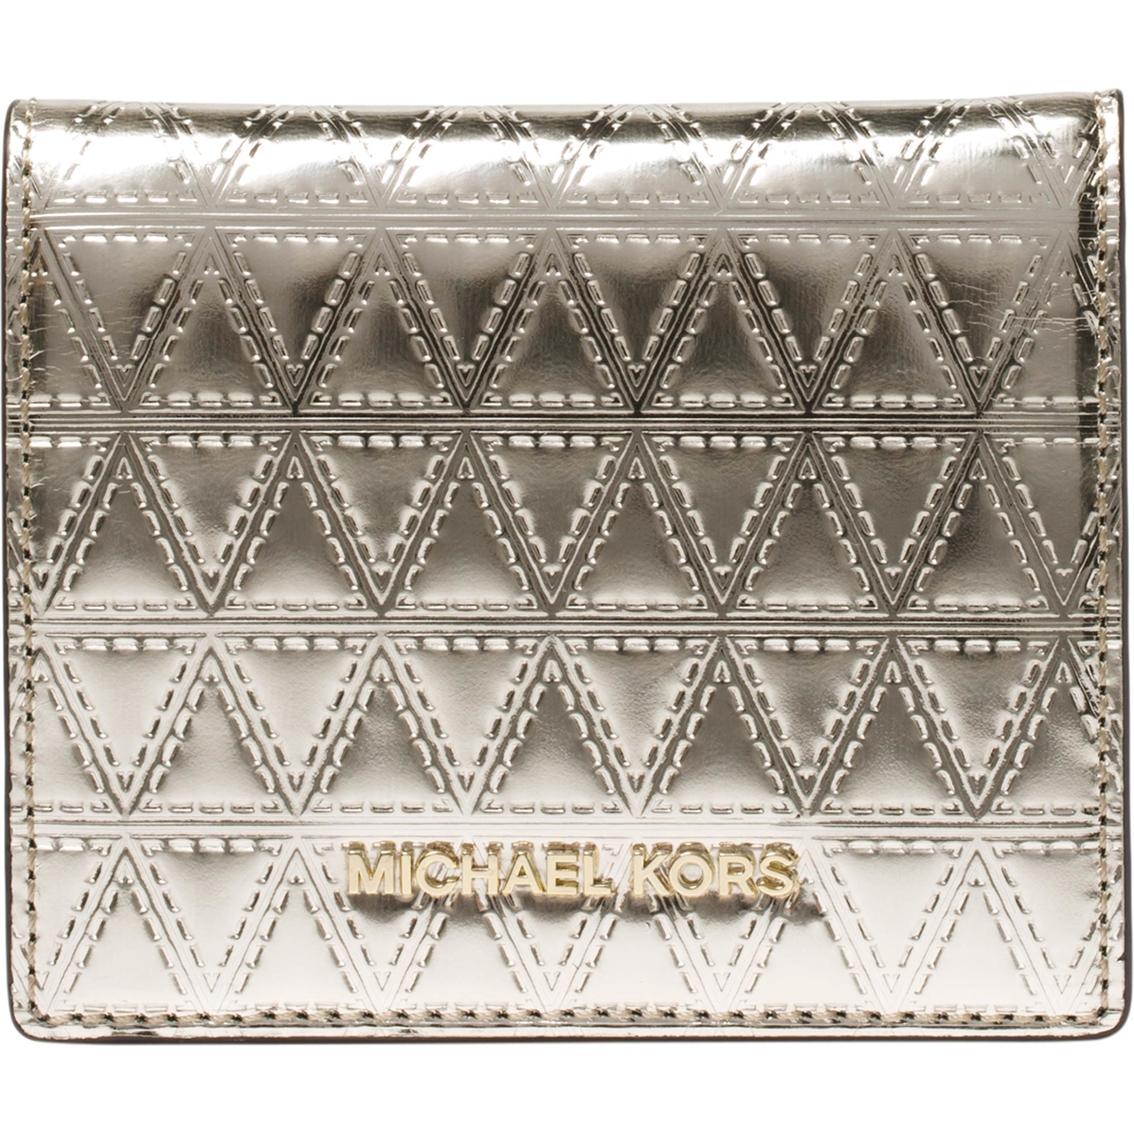 19254f7ffcd54b Michael Kors Money Pieces Flap Card Holder | Wallets | Handbags ...